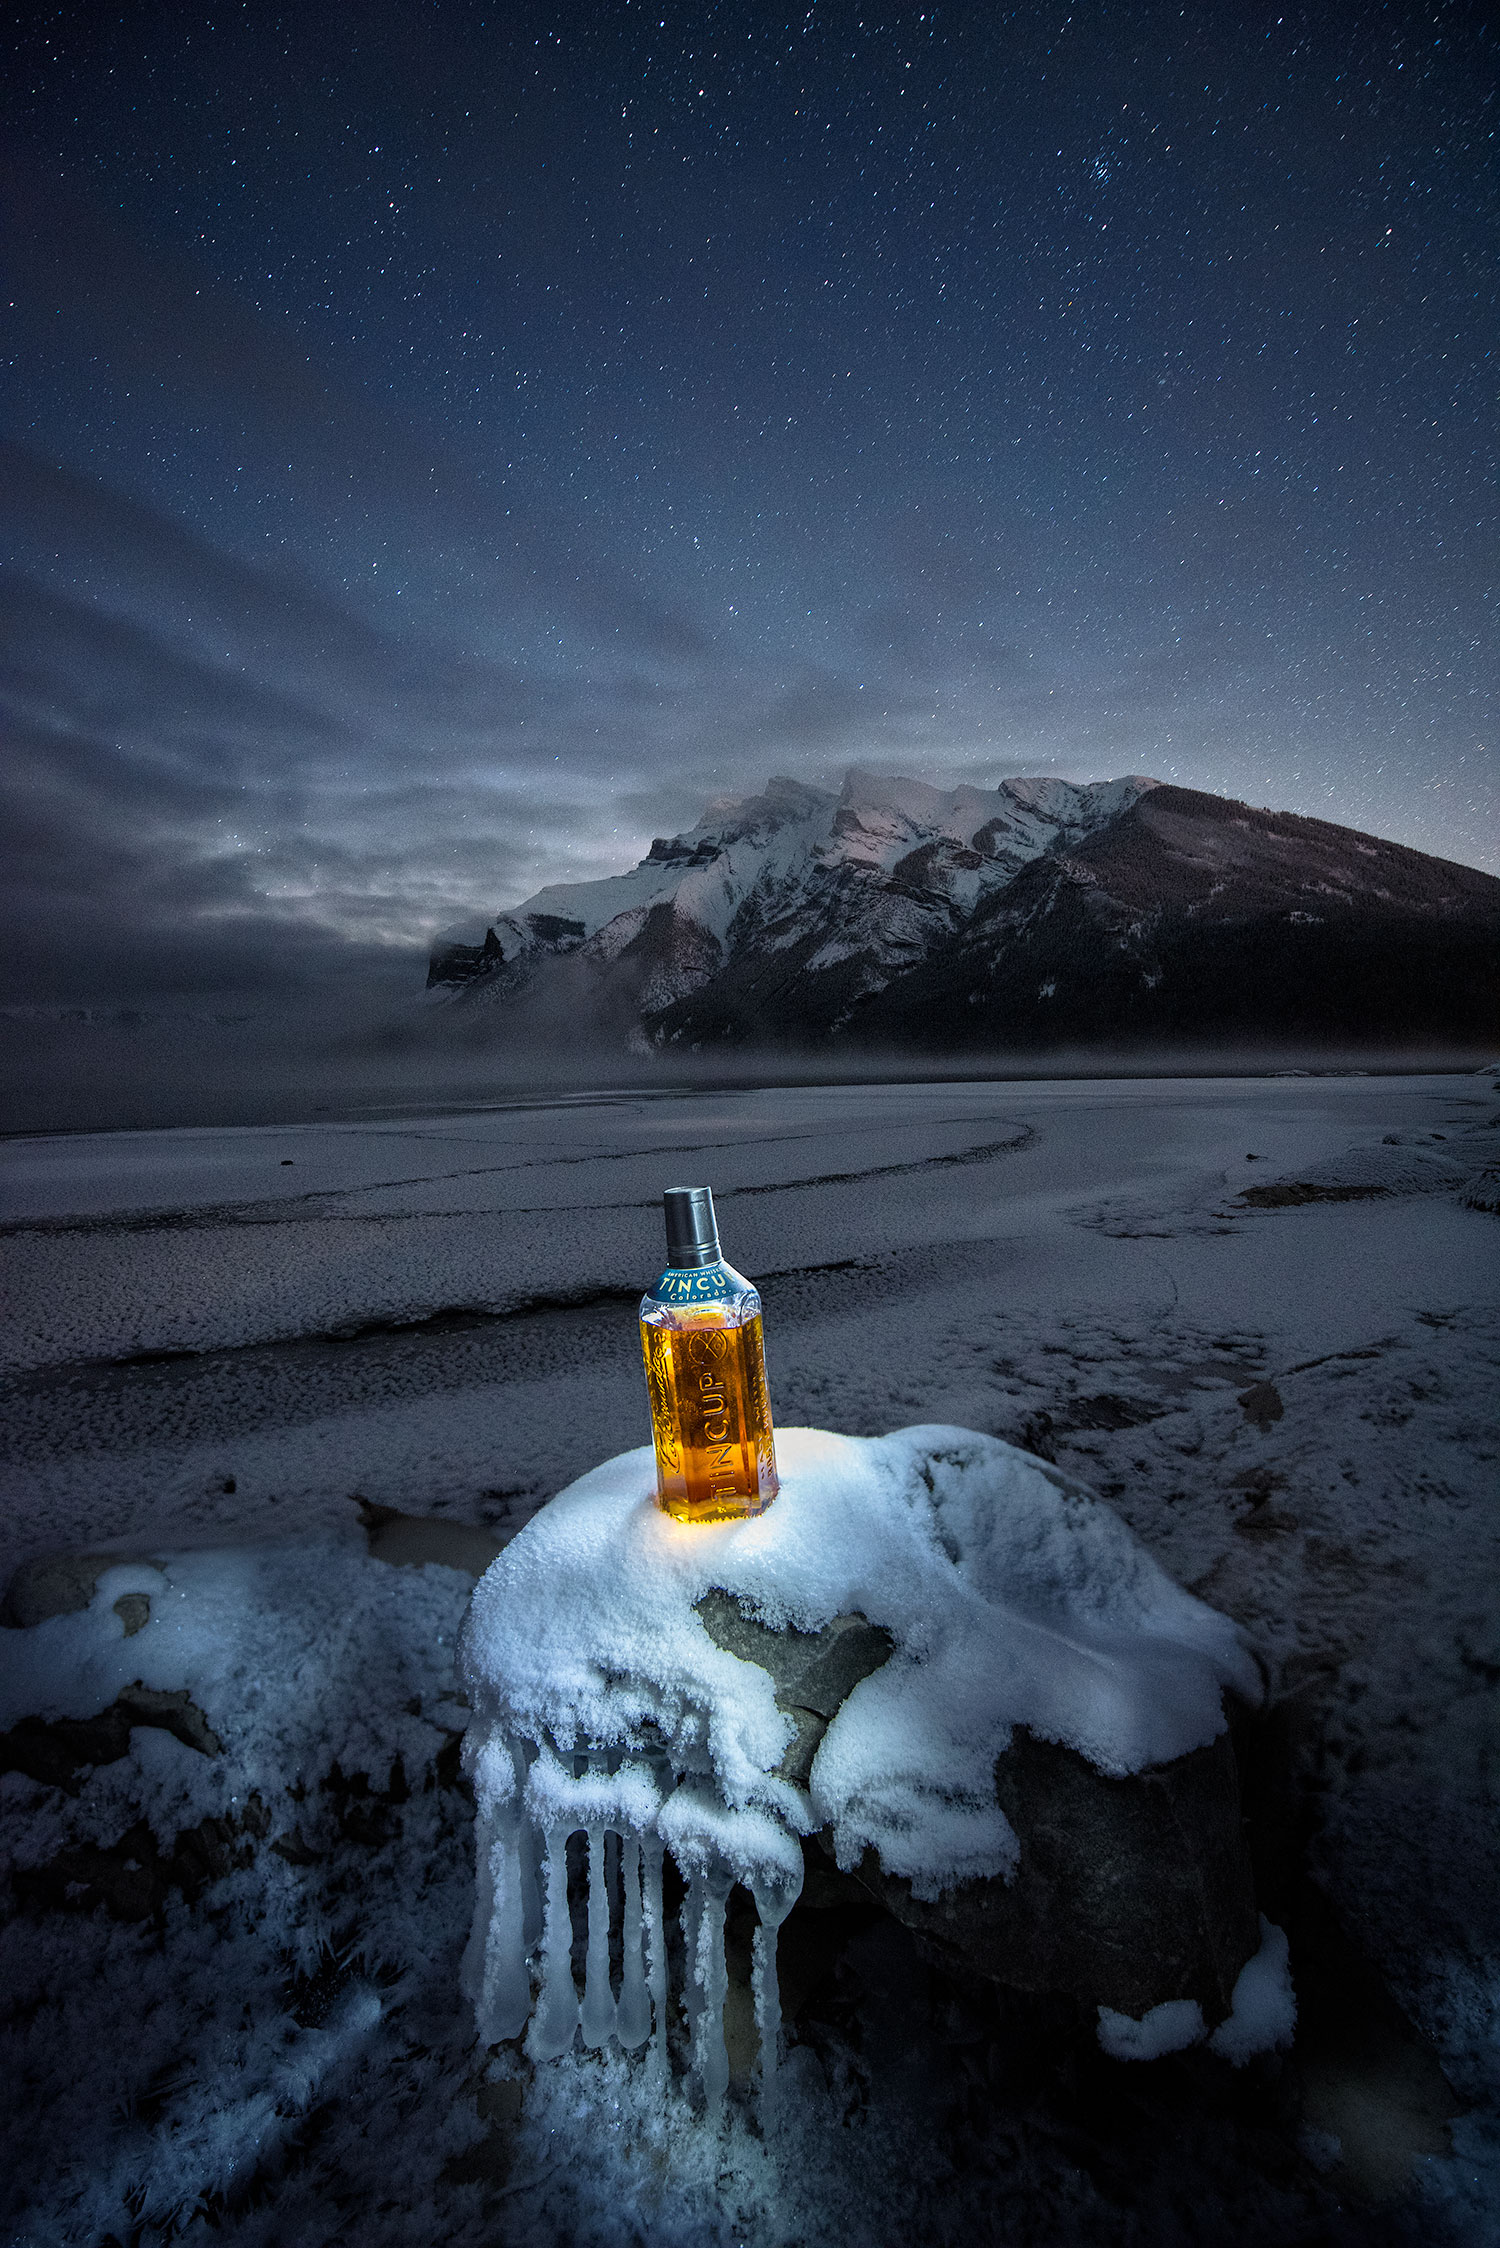 austin-trigg-whiskey-banff-alberta-product-TINCUP-Lake-Minnewanka-winter-night-snow.jpg